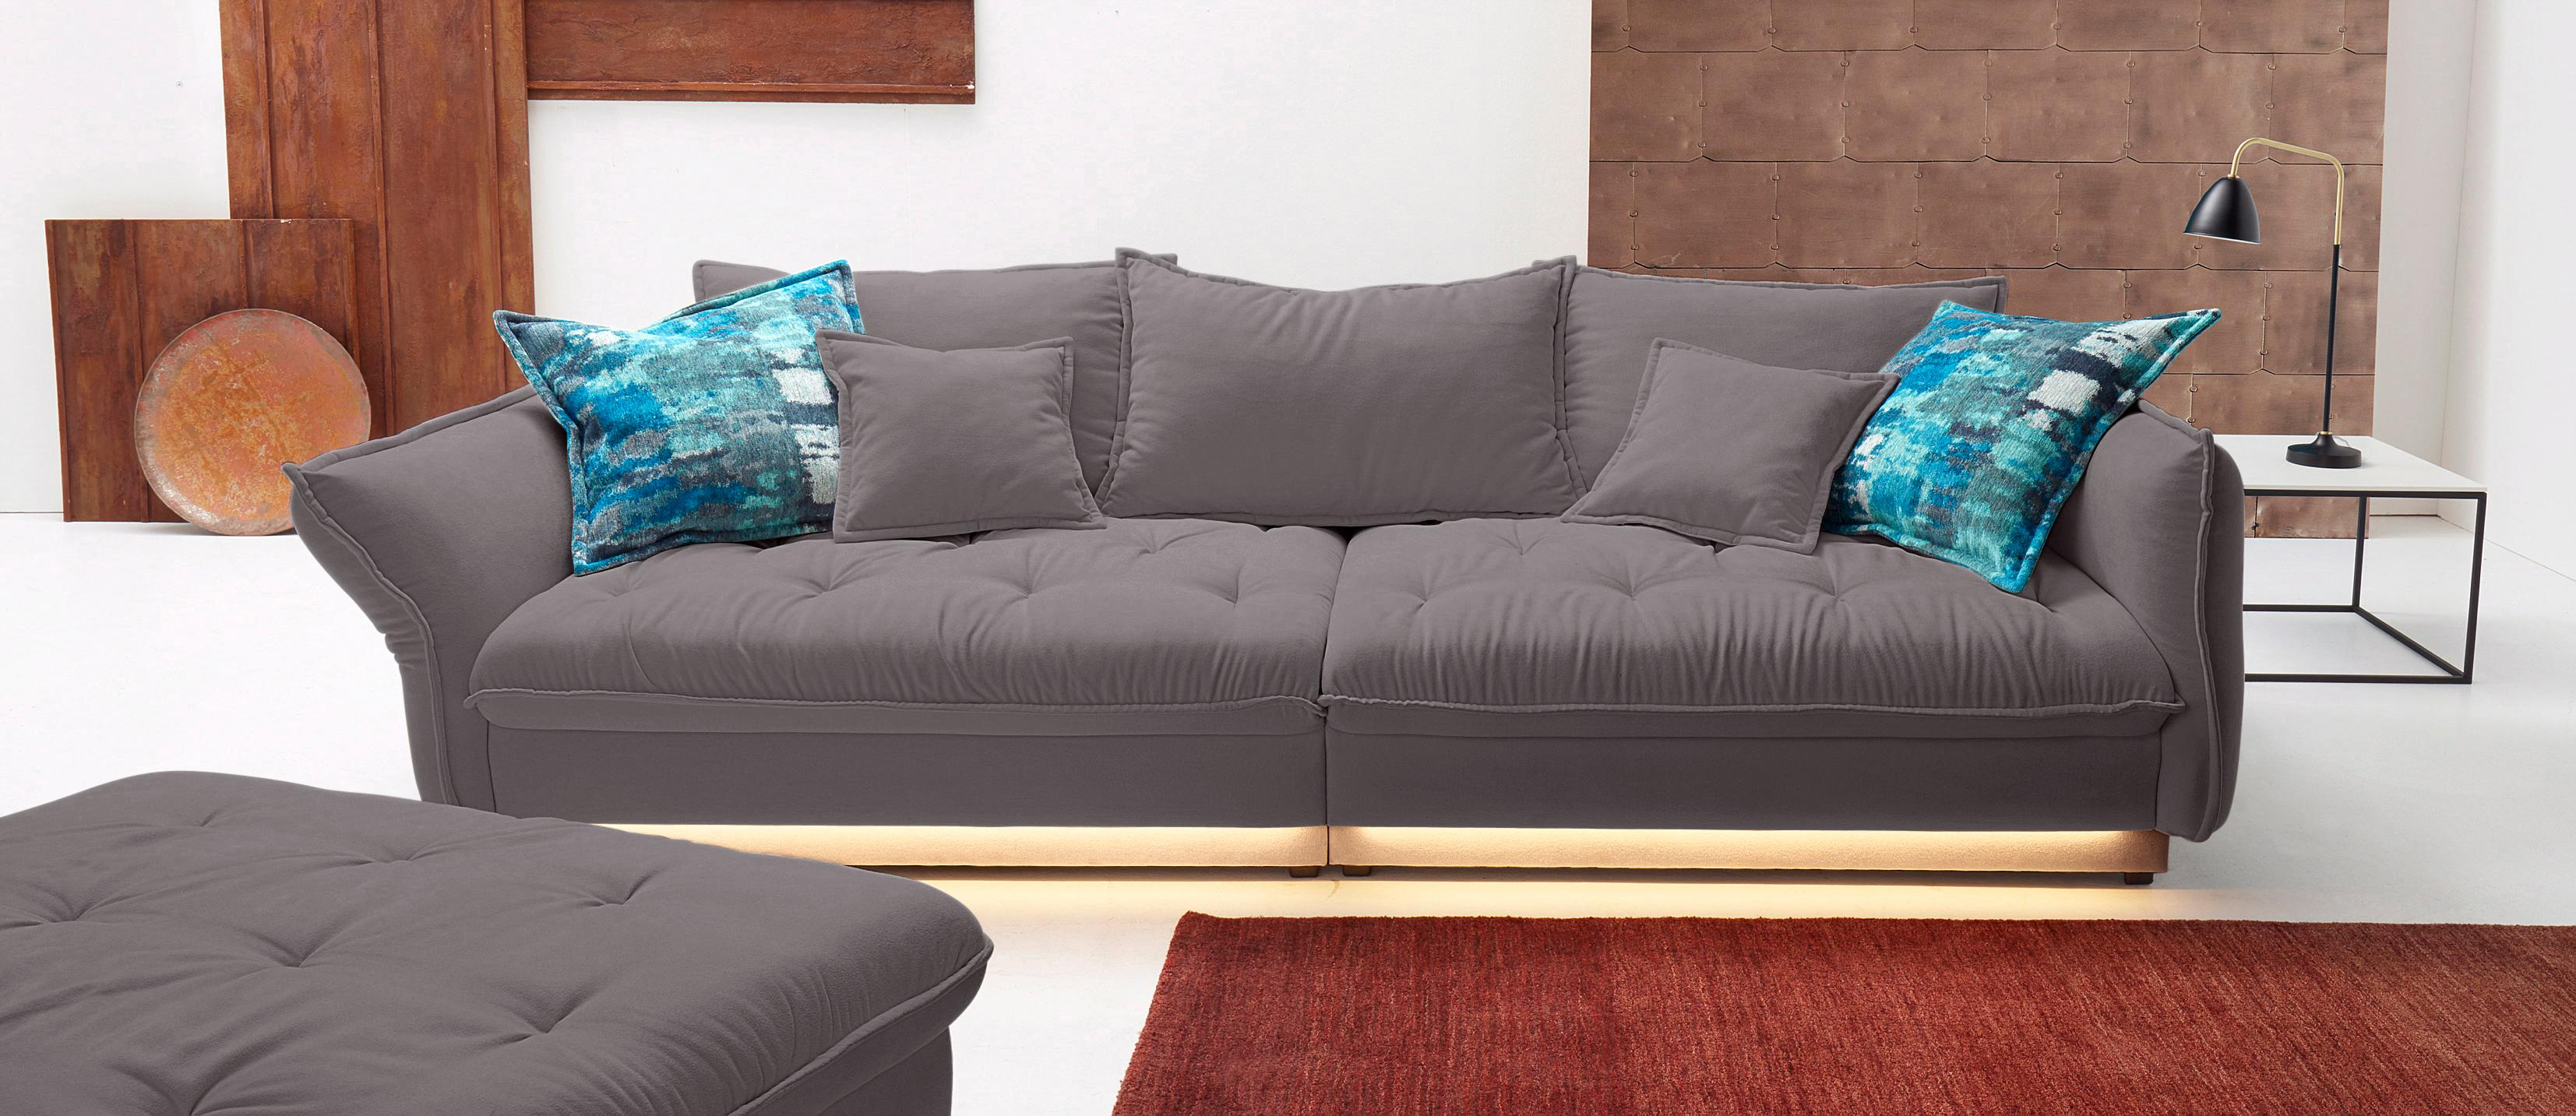 INOSIGN Big-Sofa bestellen   BAUR